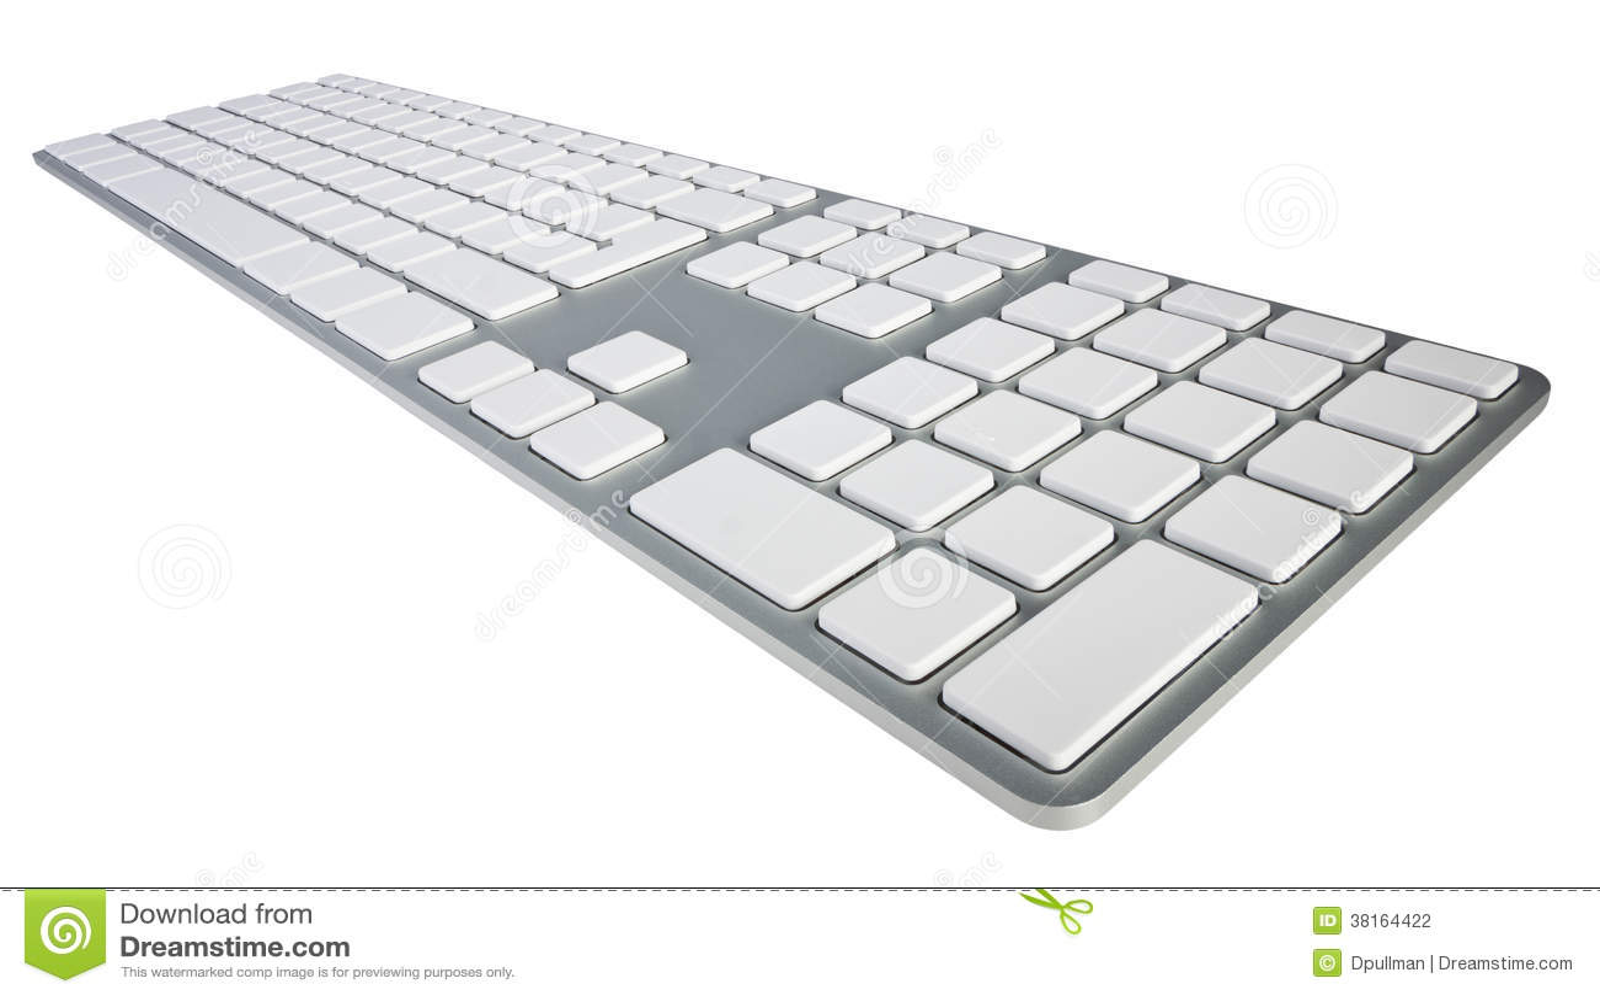 Blank Computer Keyboard Stock Photography